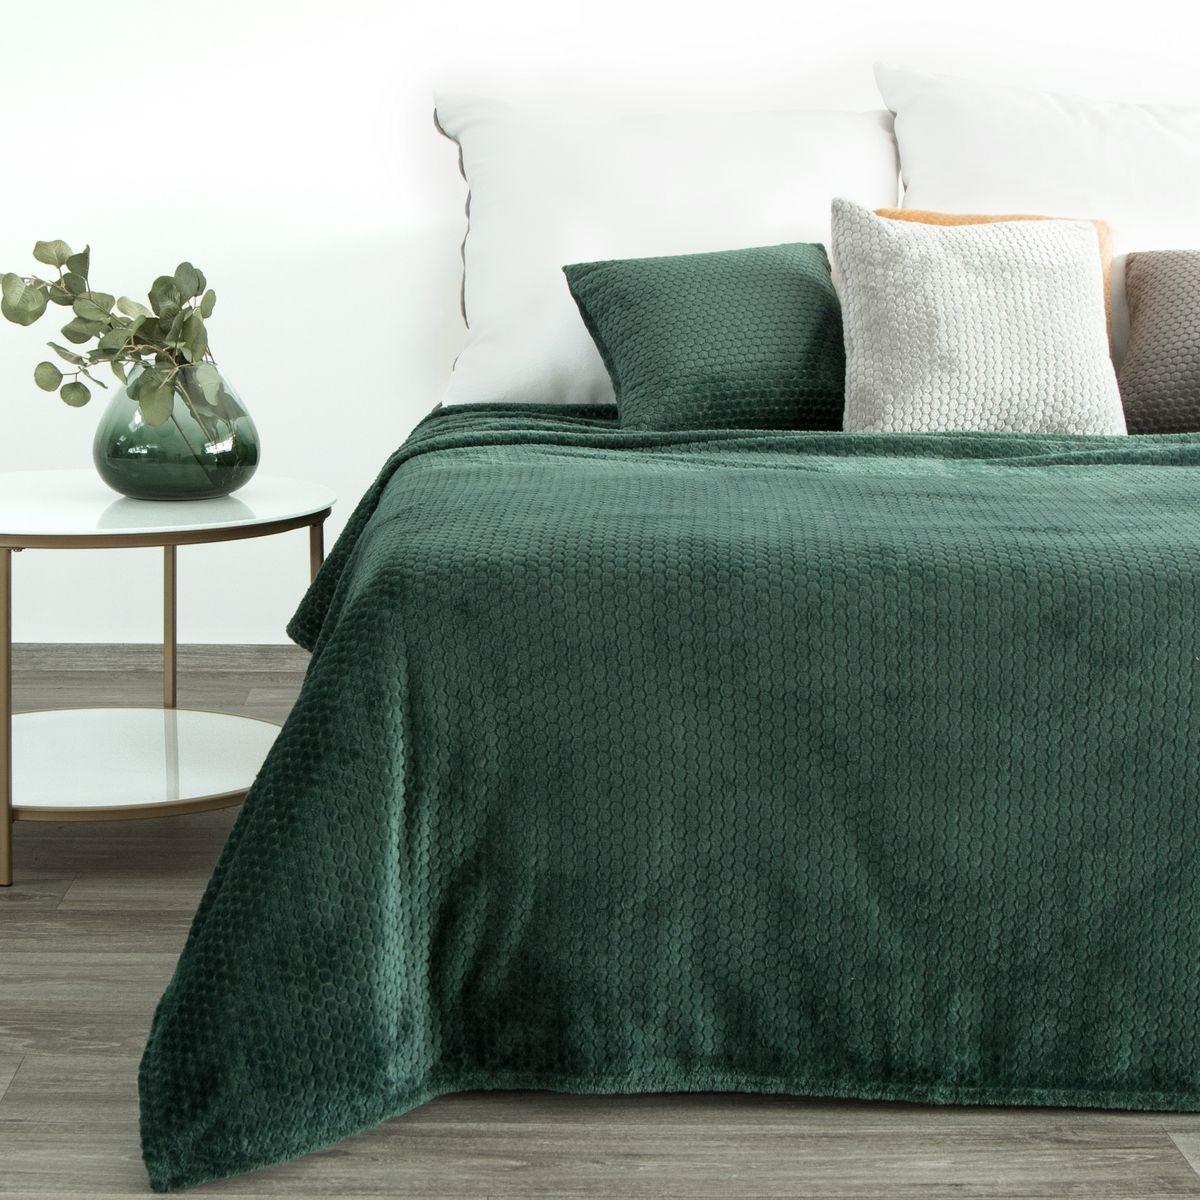 Tmavo zelená hrejivá deka s módnym reliéfnym vzorom Šírka: 150 cm   Dĺžka: 200 cm